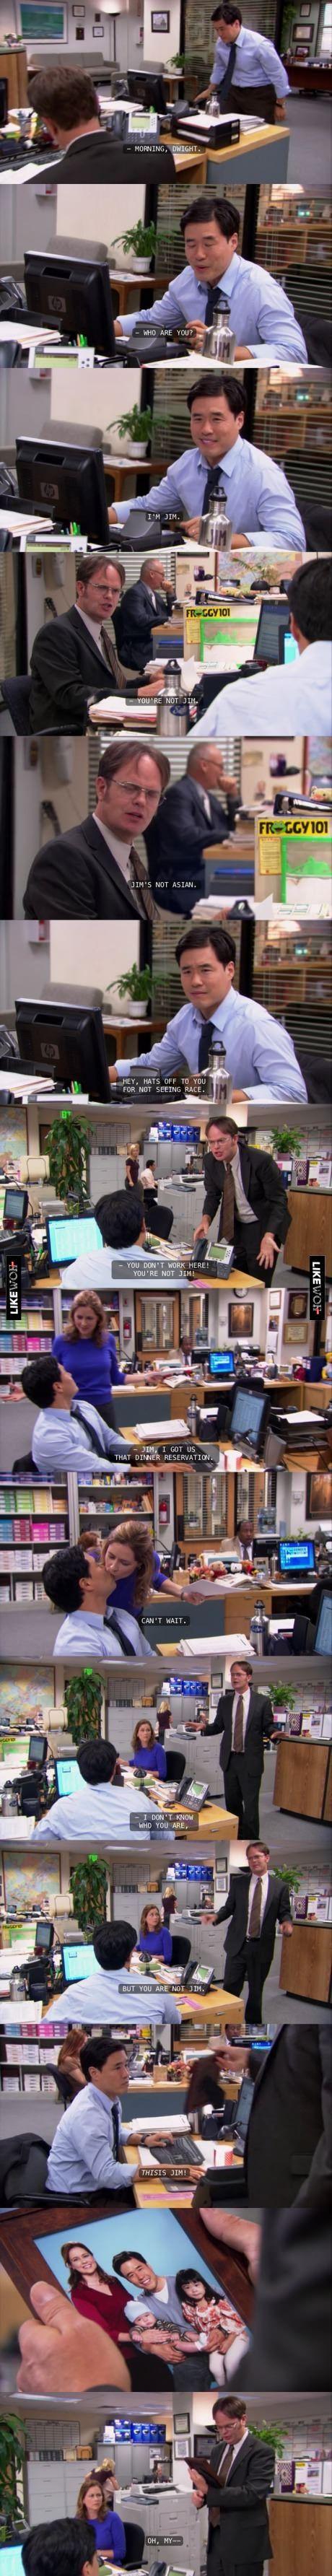 Jim's Dwight pranks are the bomb...